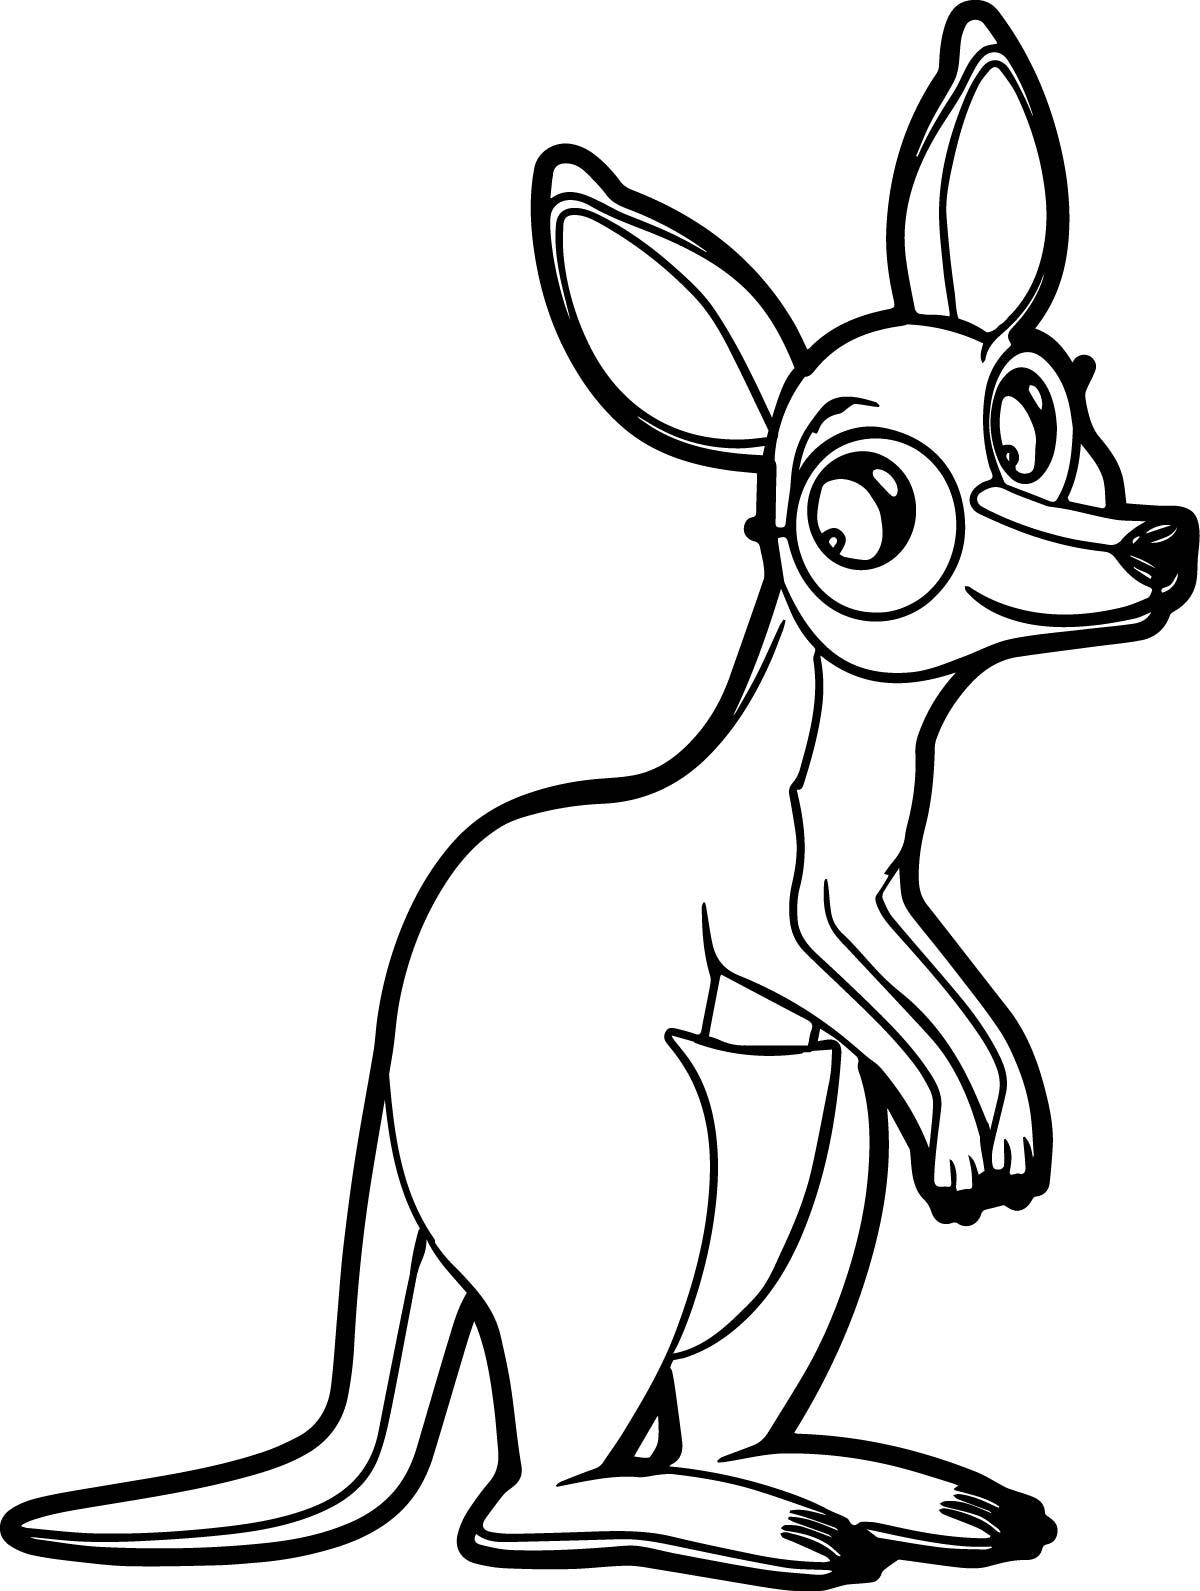 marsupial kangaroo coloring page